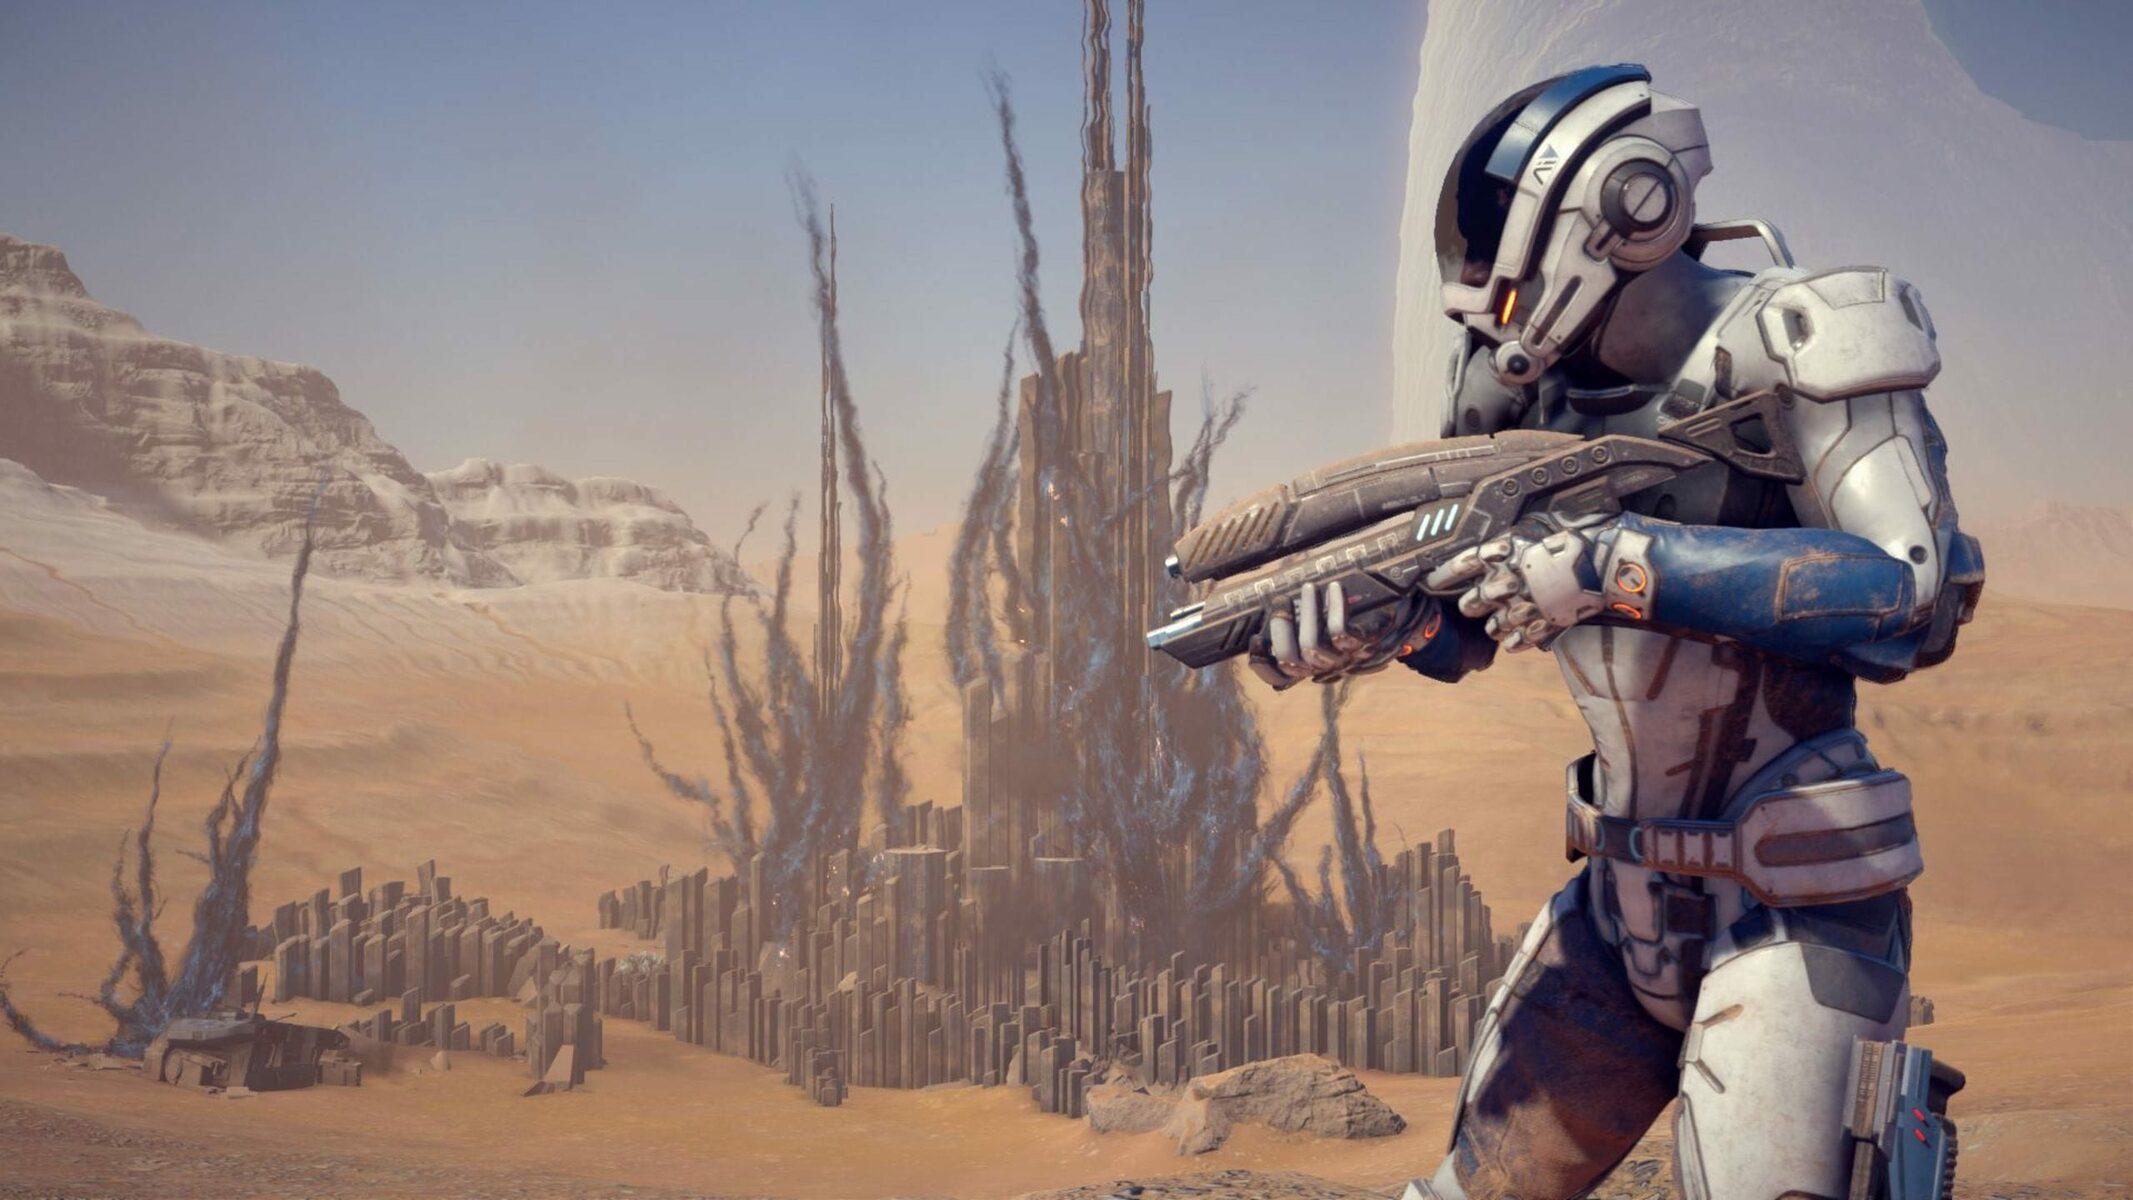 Andromeda Day Buy One Mass Effect EditionEneba ybIY6vf7gm